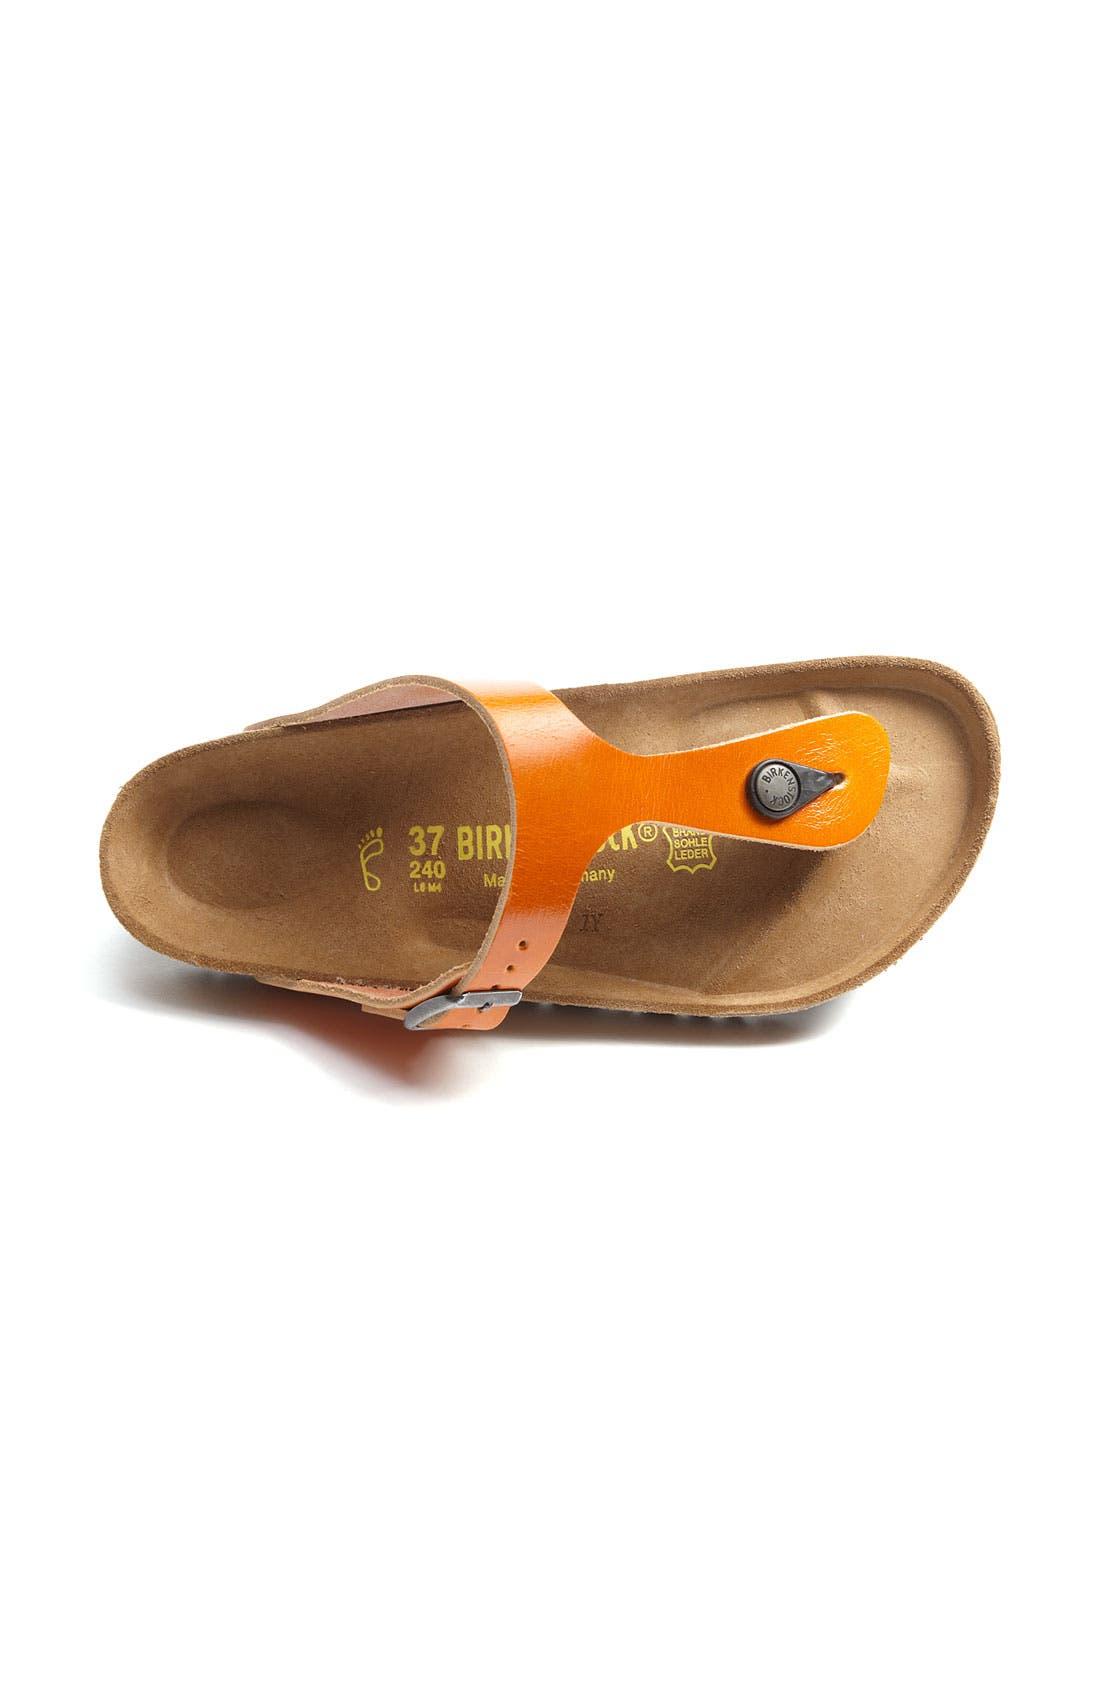 Alternate Image 3  - Birkenstock 'Gizeh' Sandal (Exclusive)